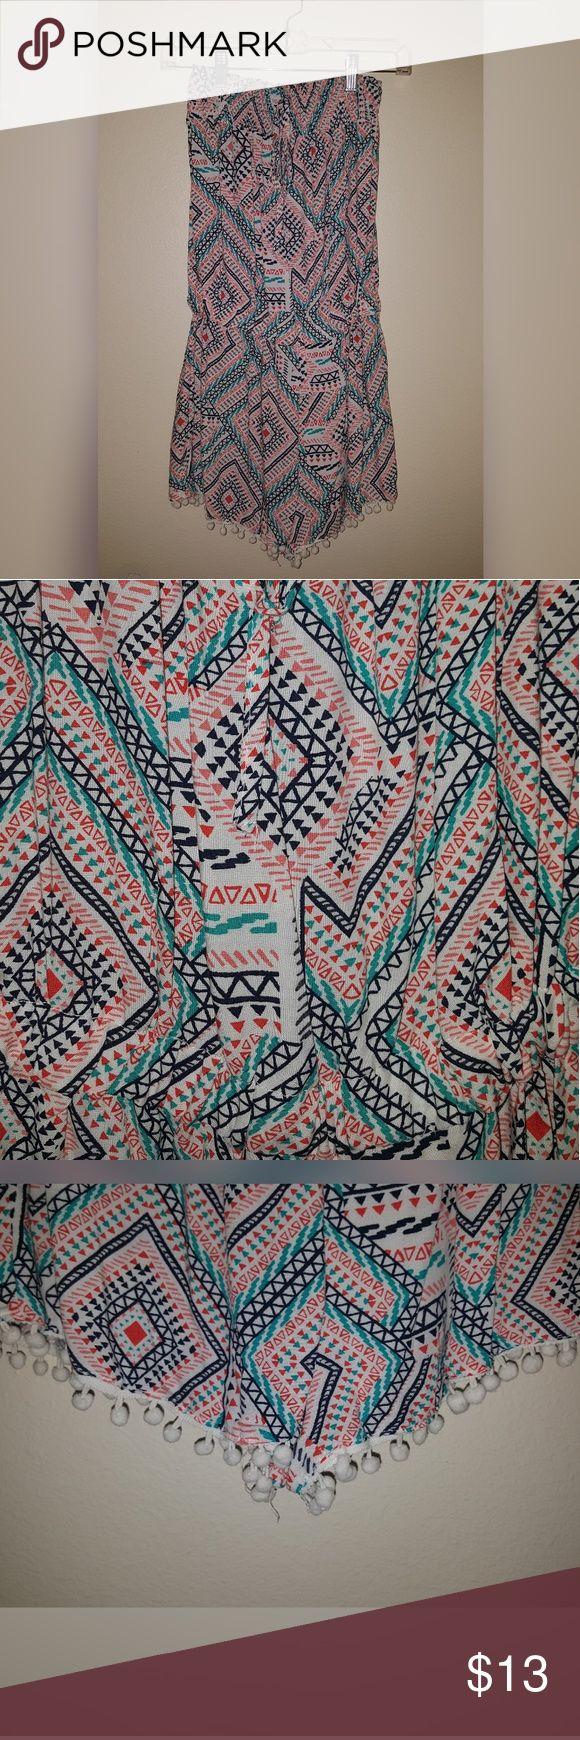 Geo Aztec Smocked Off-Shoulder Romper Colorful Geo Aztec Smocked Off-Shoulder Tube Top Romper With Pom Pom Fringe - Worn A Few Times - No Tears, Stains, or Smells Rue 21 Other